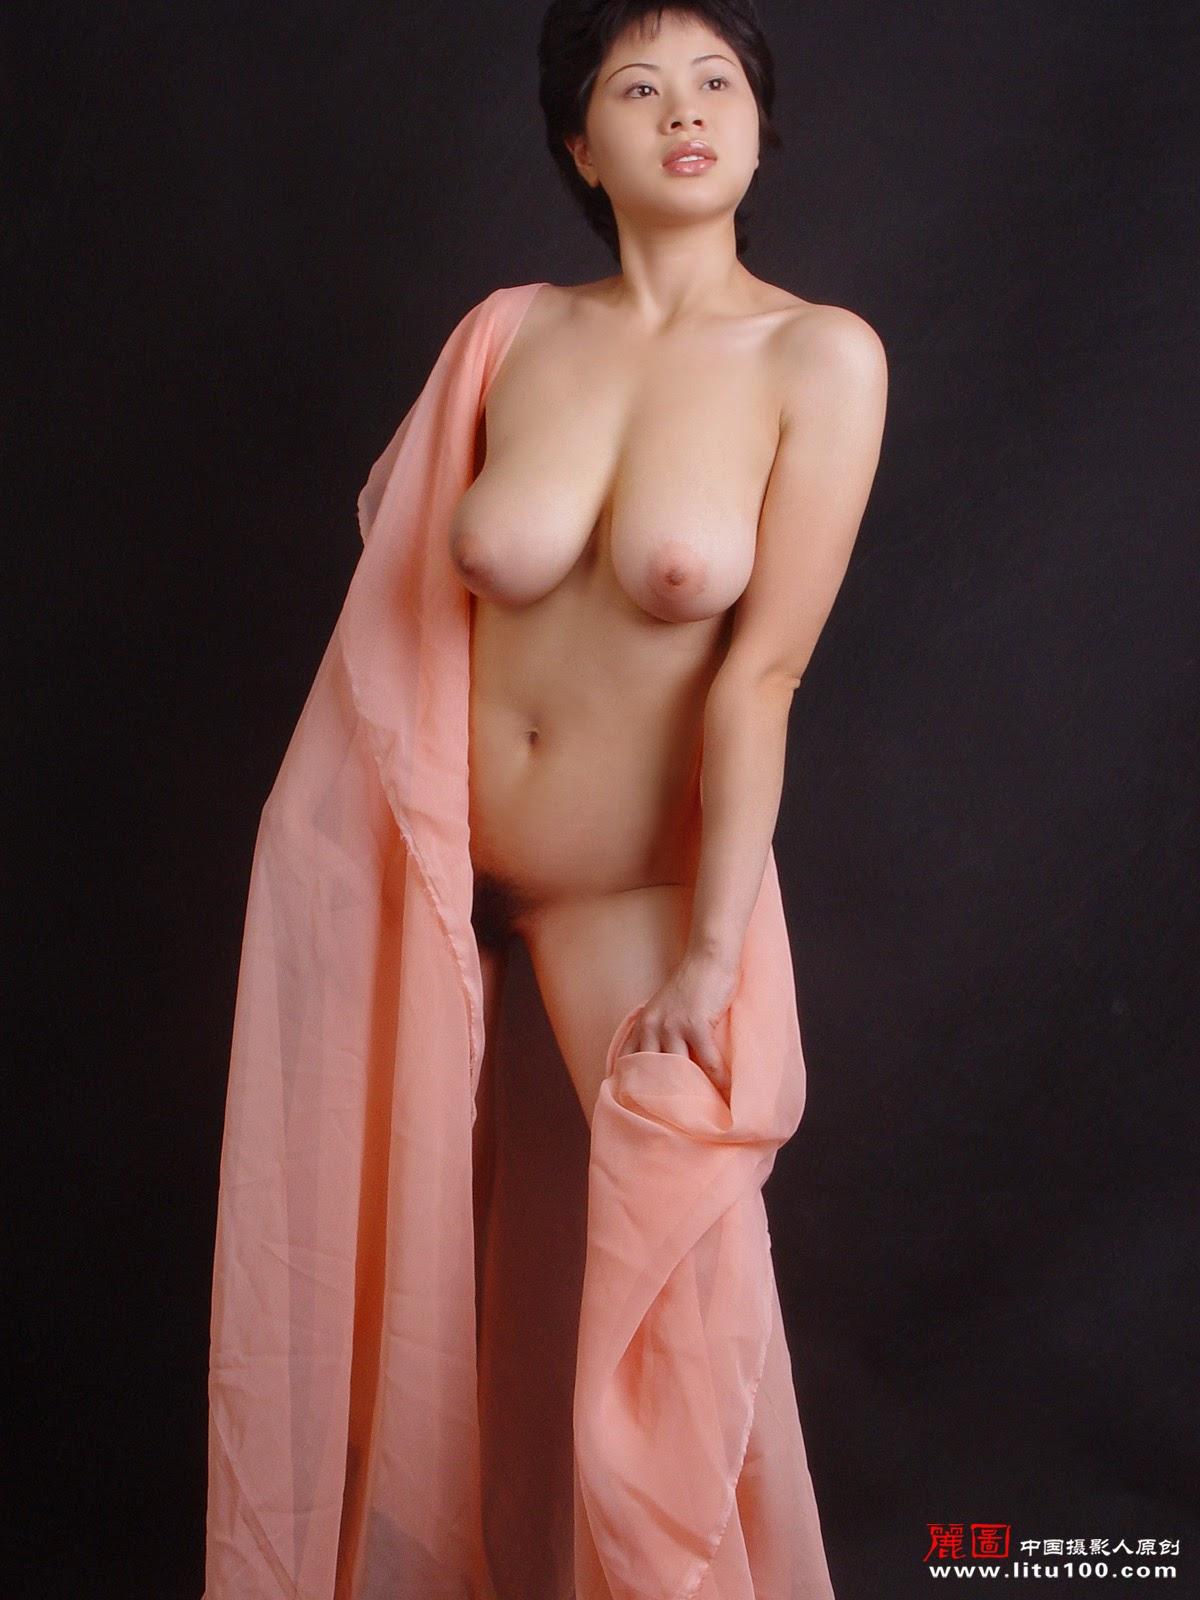 Chinese nudeModel ShanShan